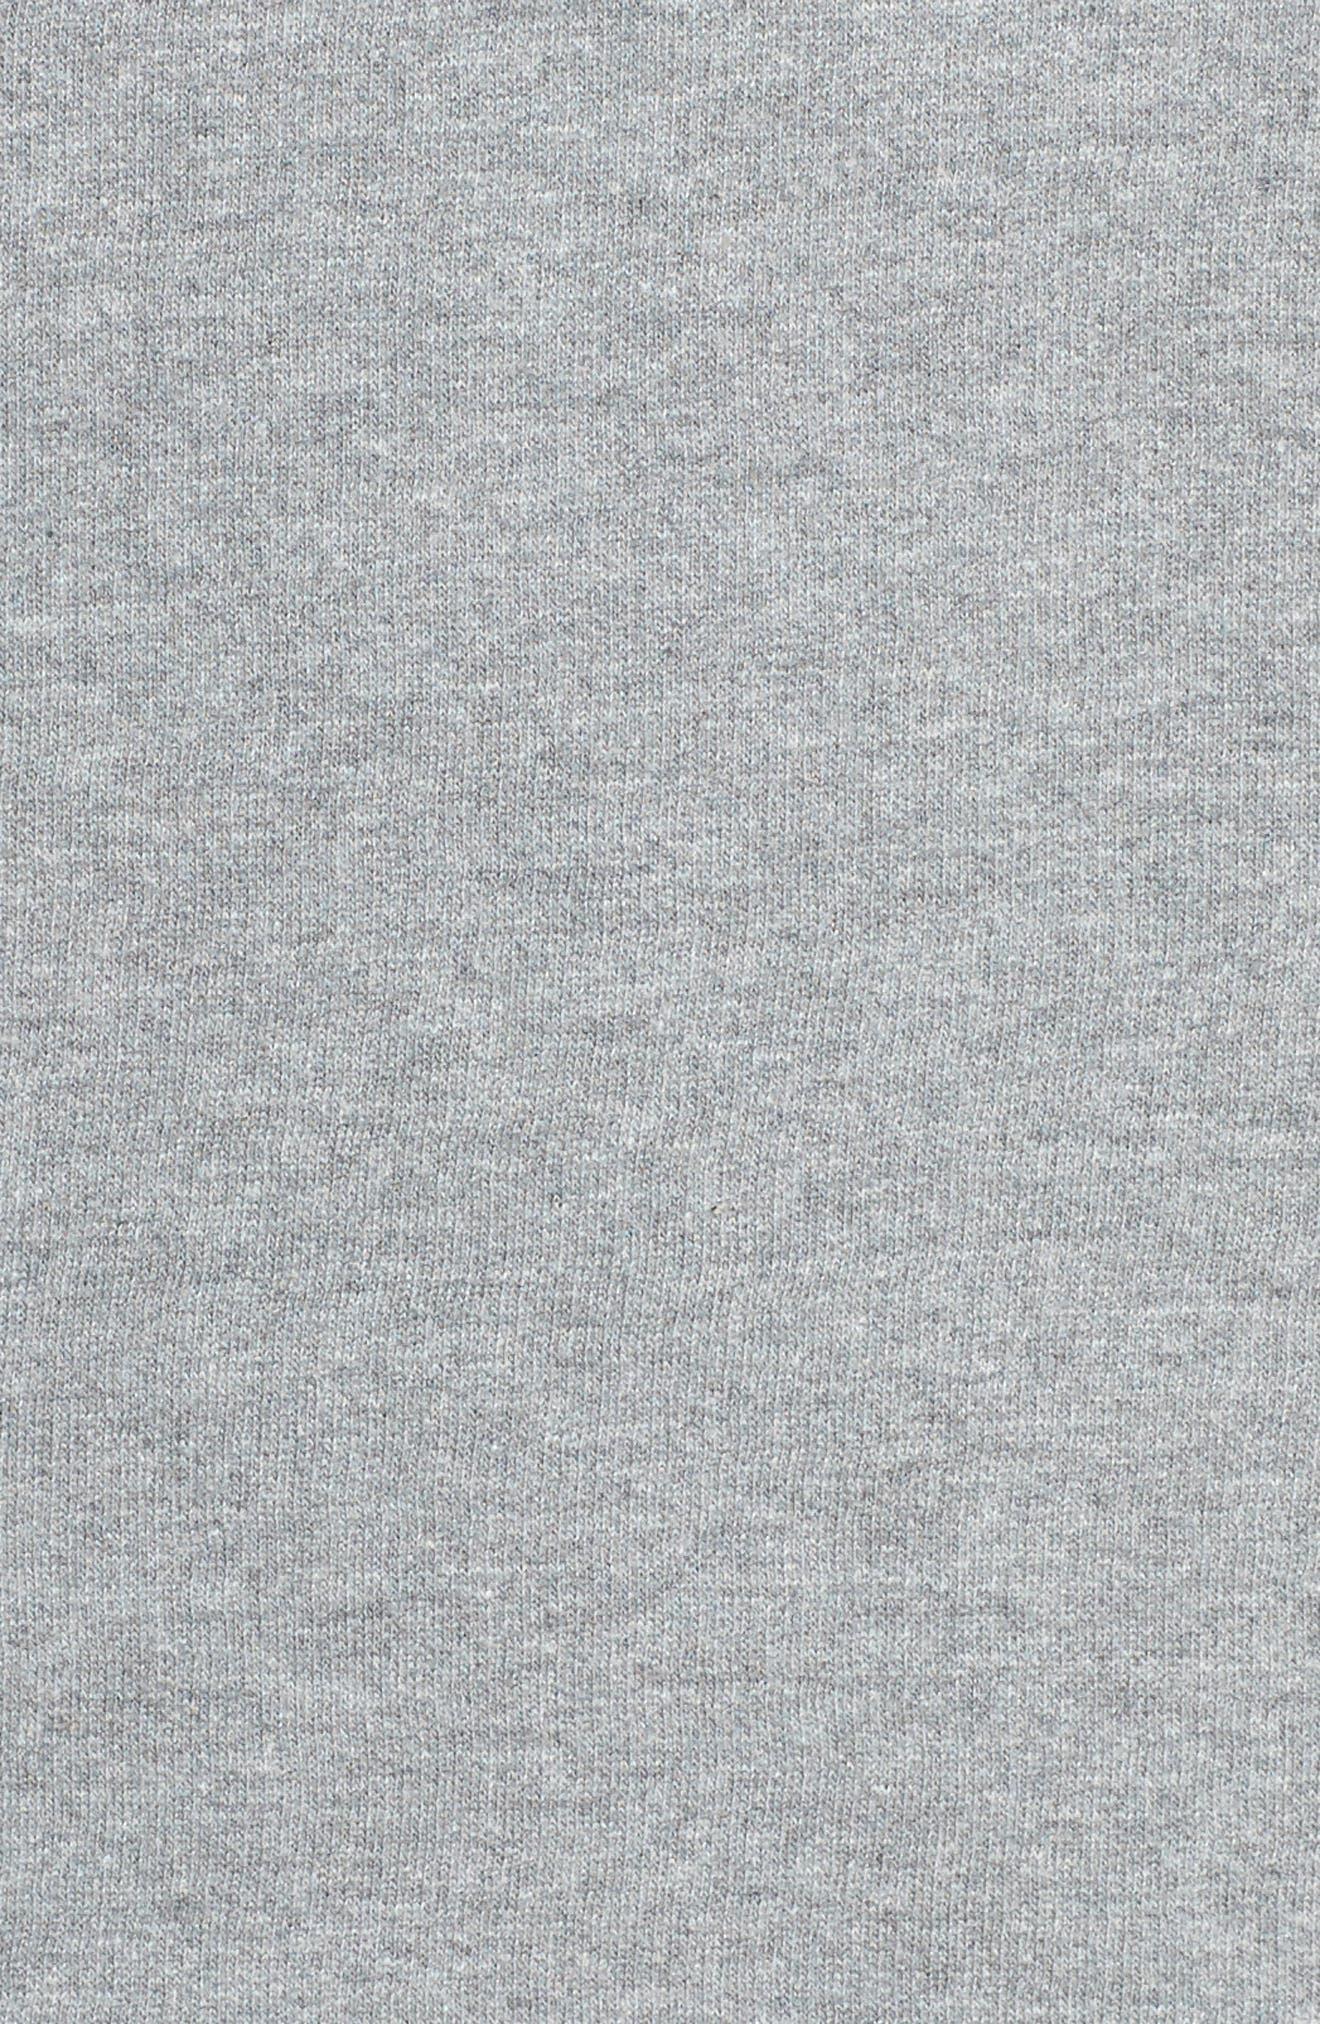 'This Wine' Crewneck Sweatshirt,                             Alternate thumbnail 10, color,